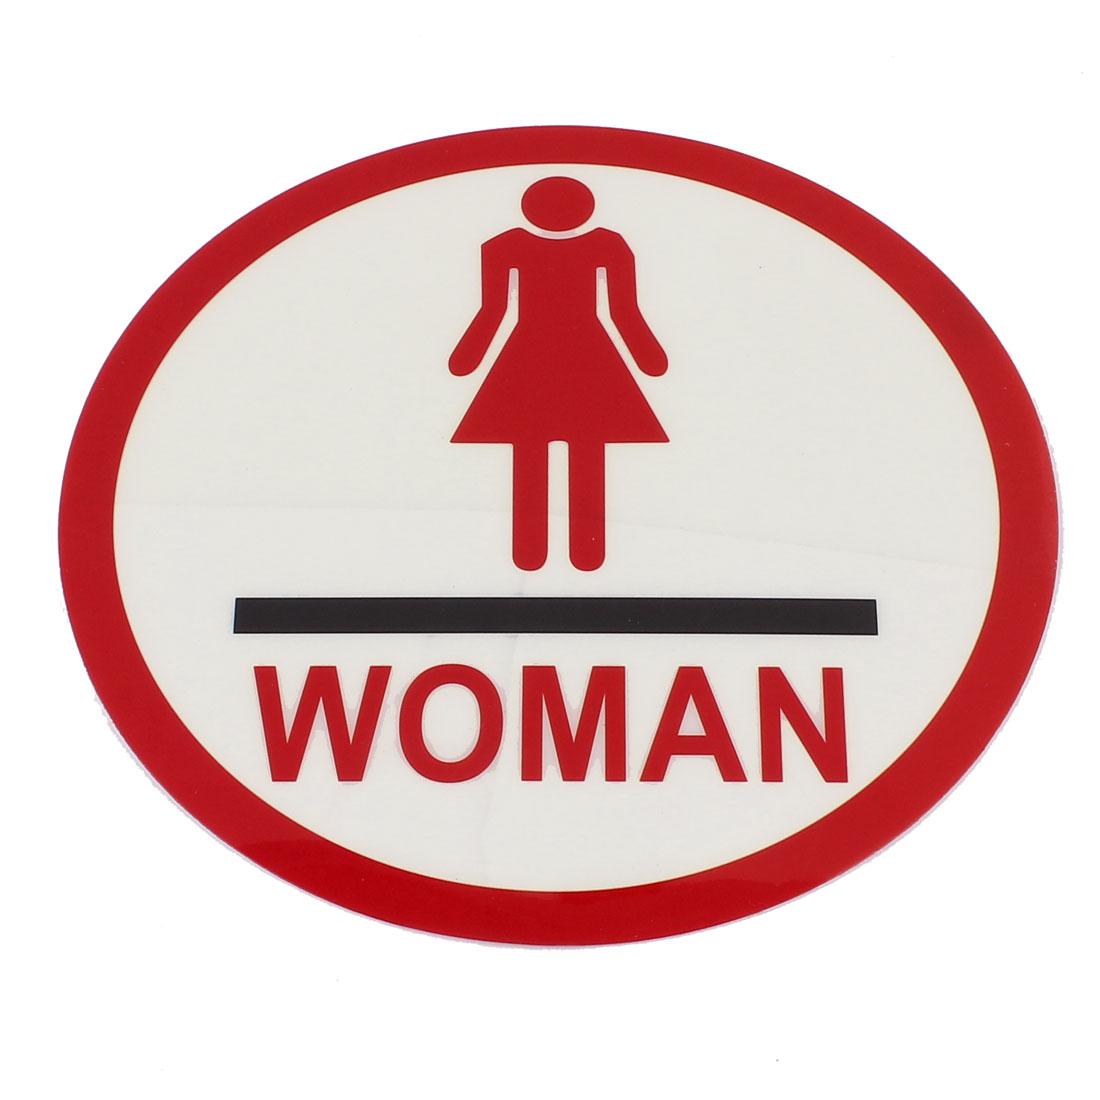 Women W.C. Restroom Washroom Toilet Door Wall Notice Self Adhesive Sign Sticker Instruction Board